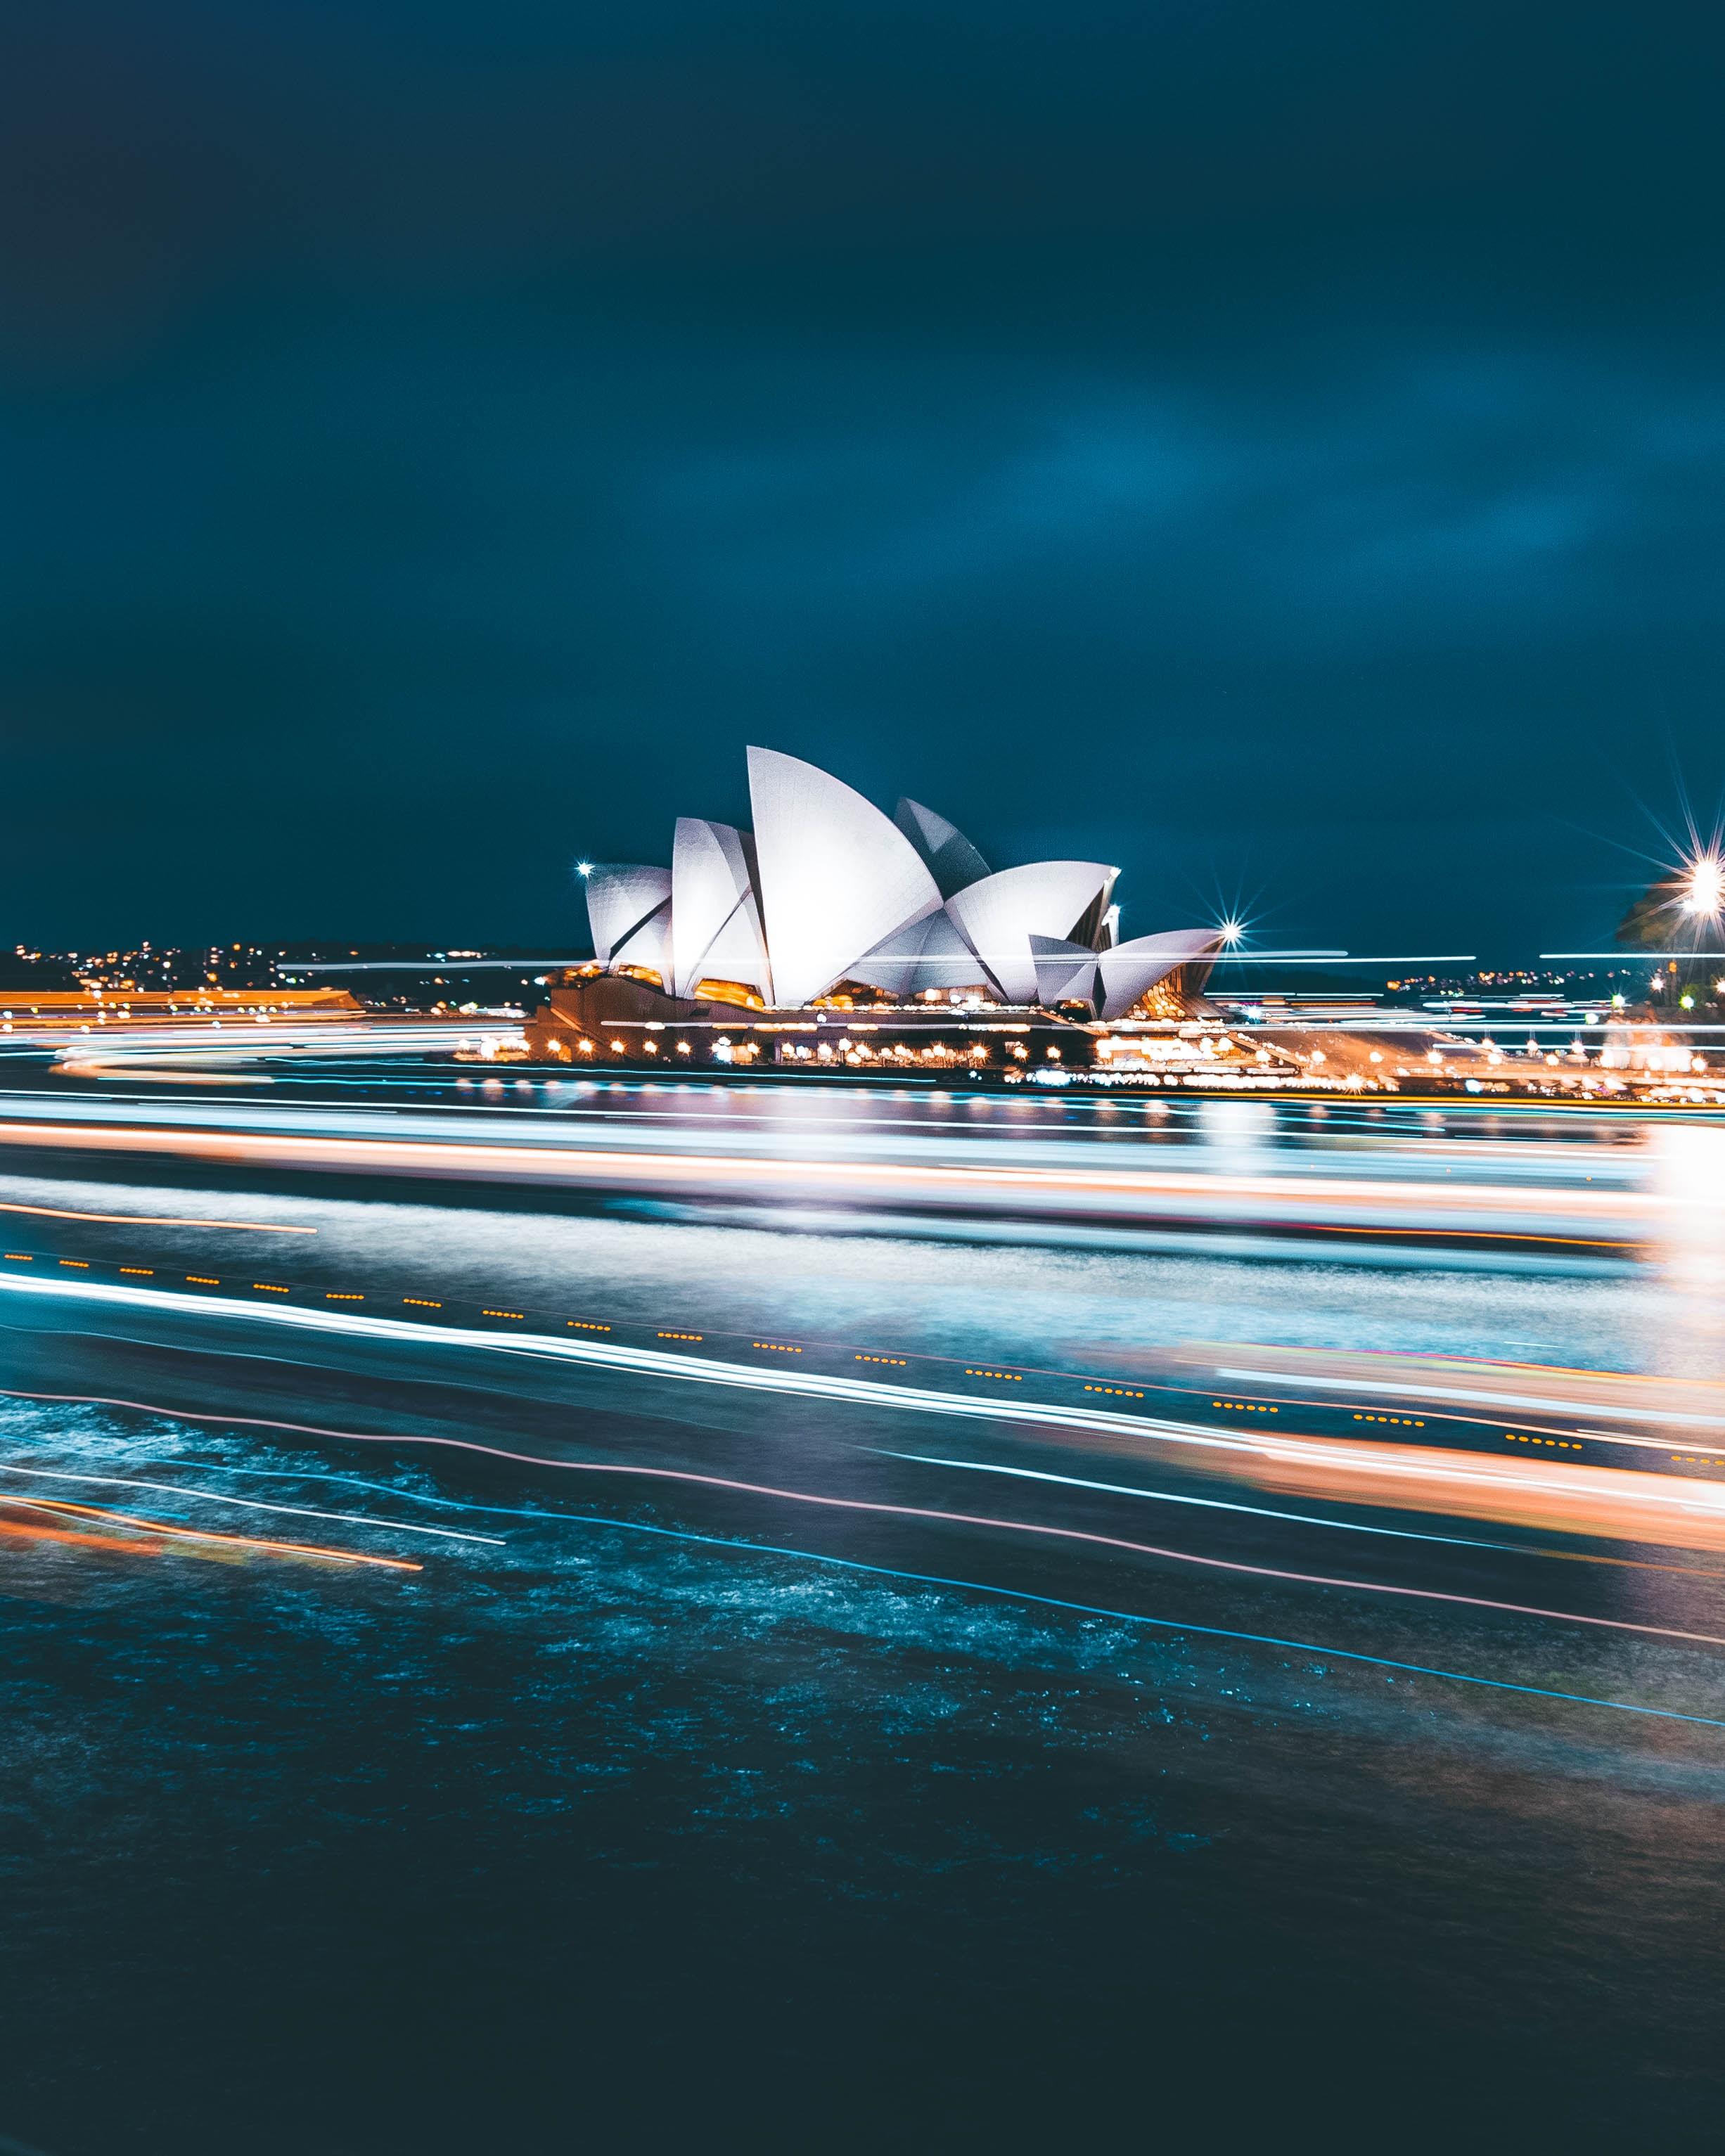 Sydney Opera House during nighttime